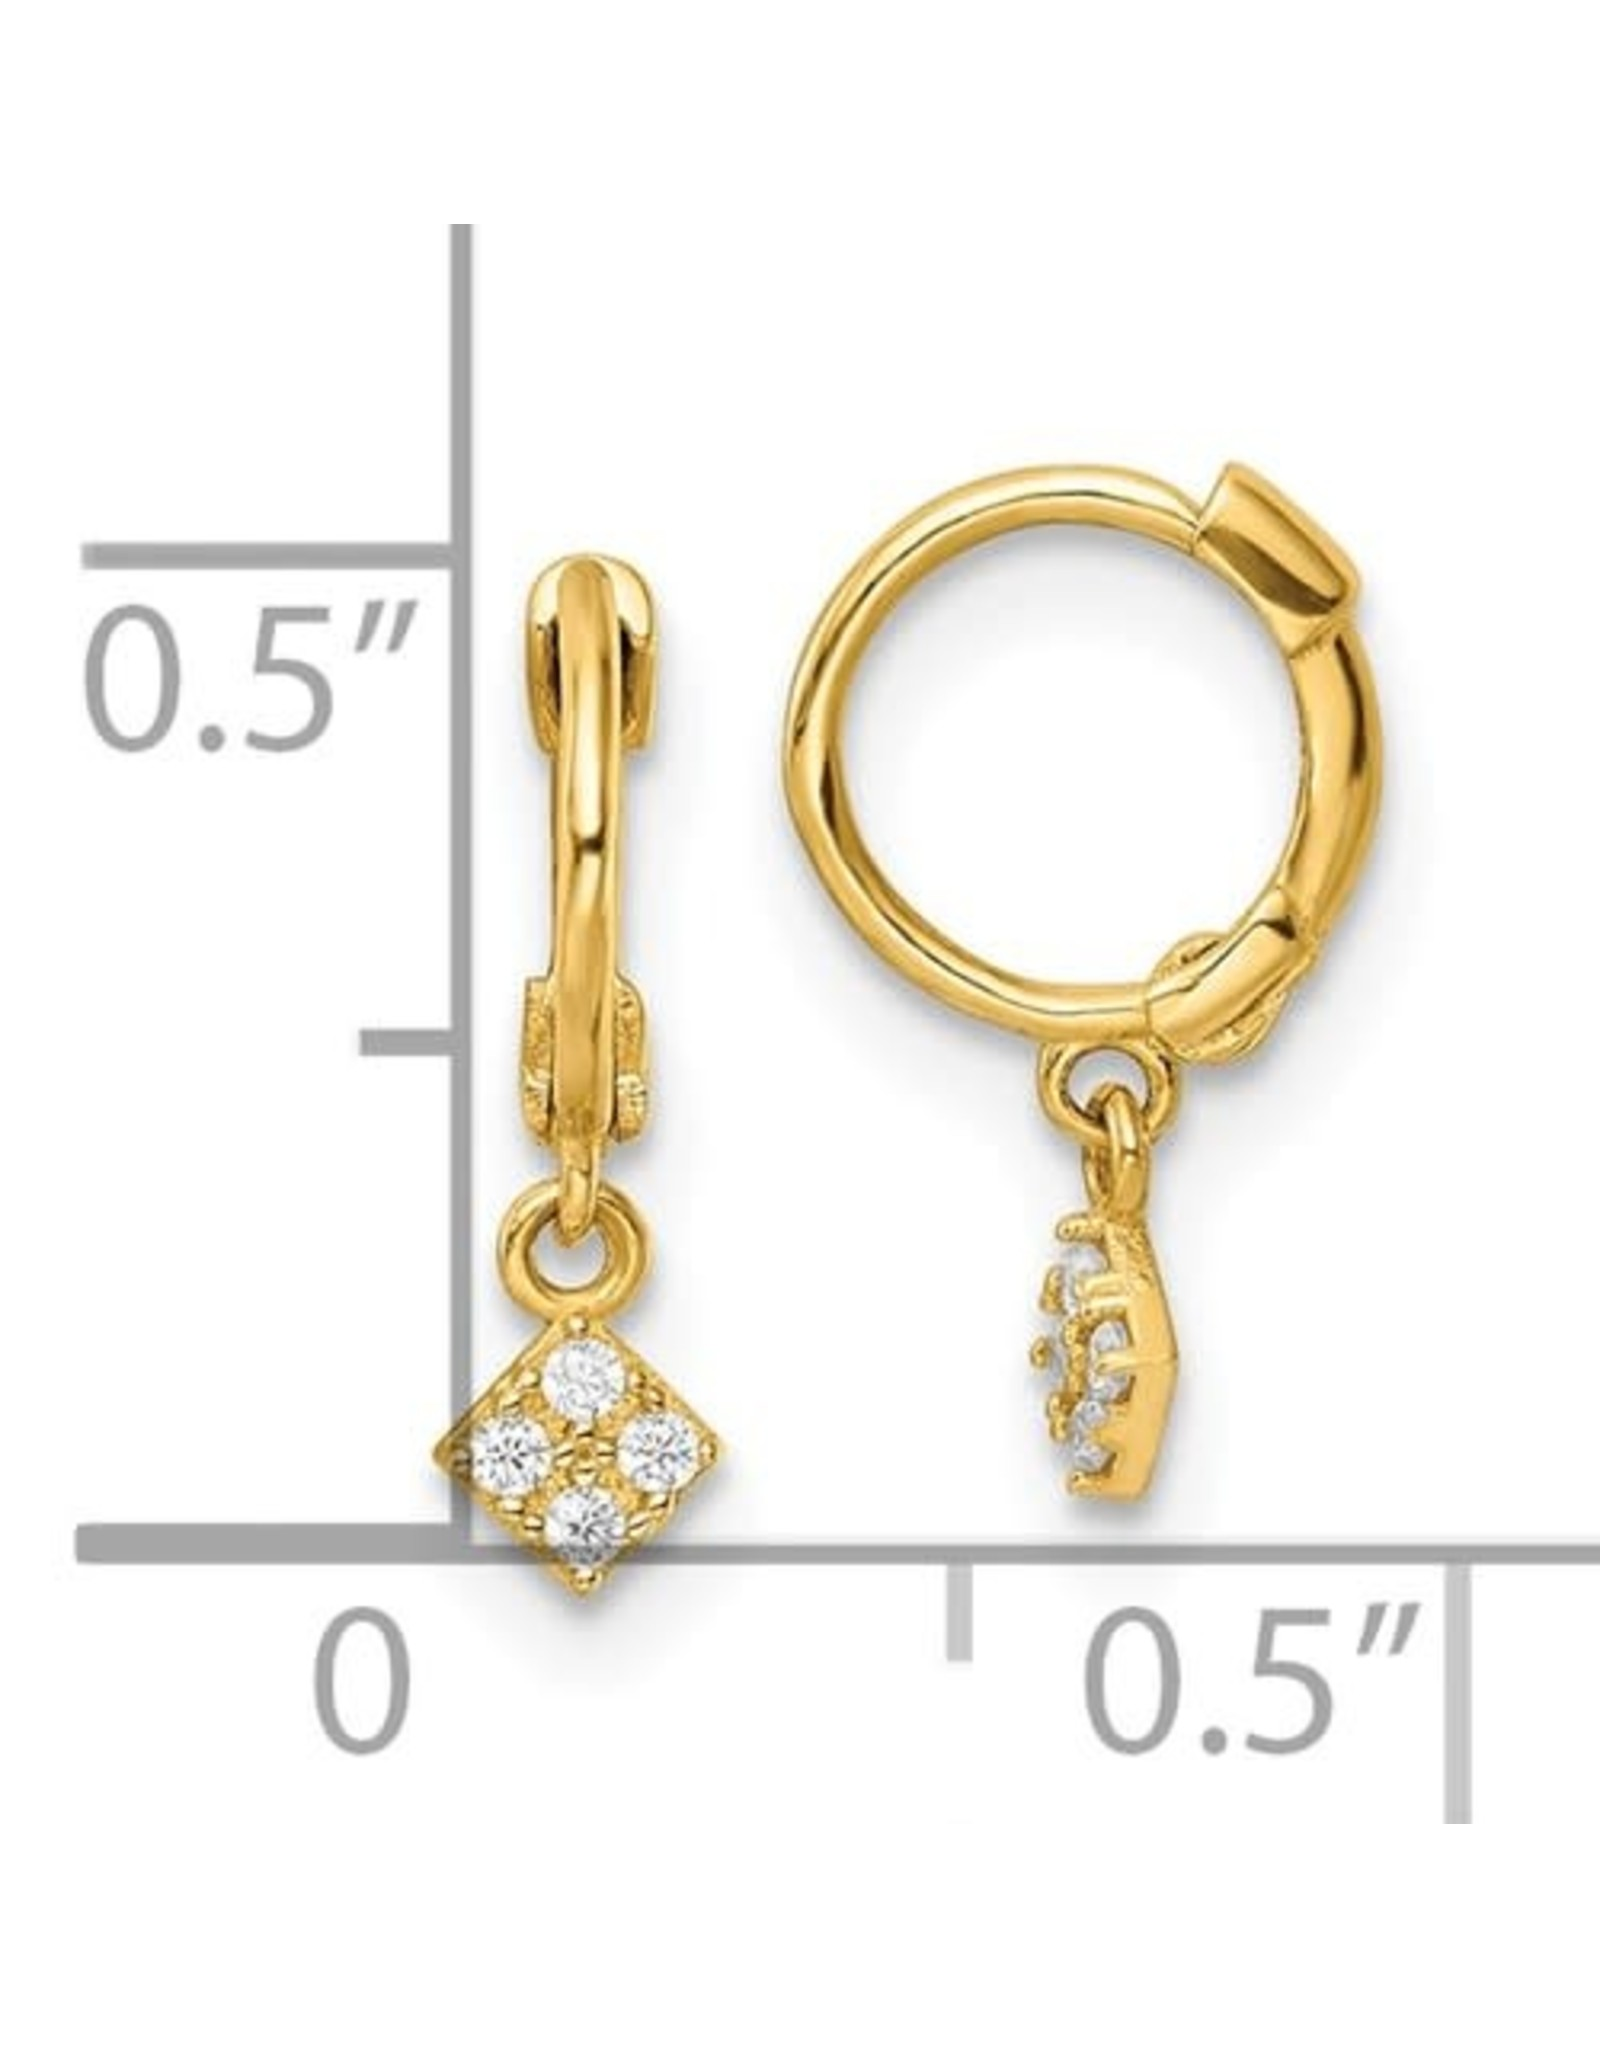 14K Young Lady's Yellow Gold Zirconia Dangle Earrings